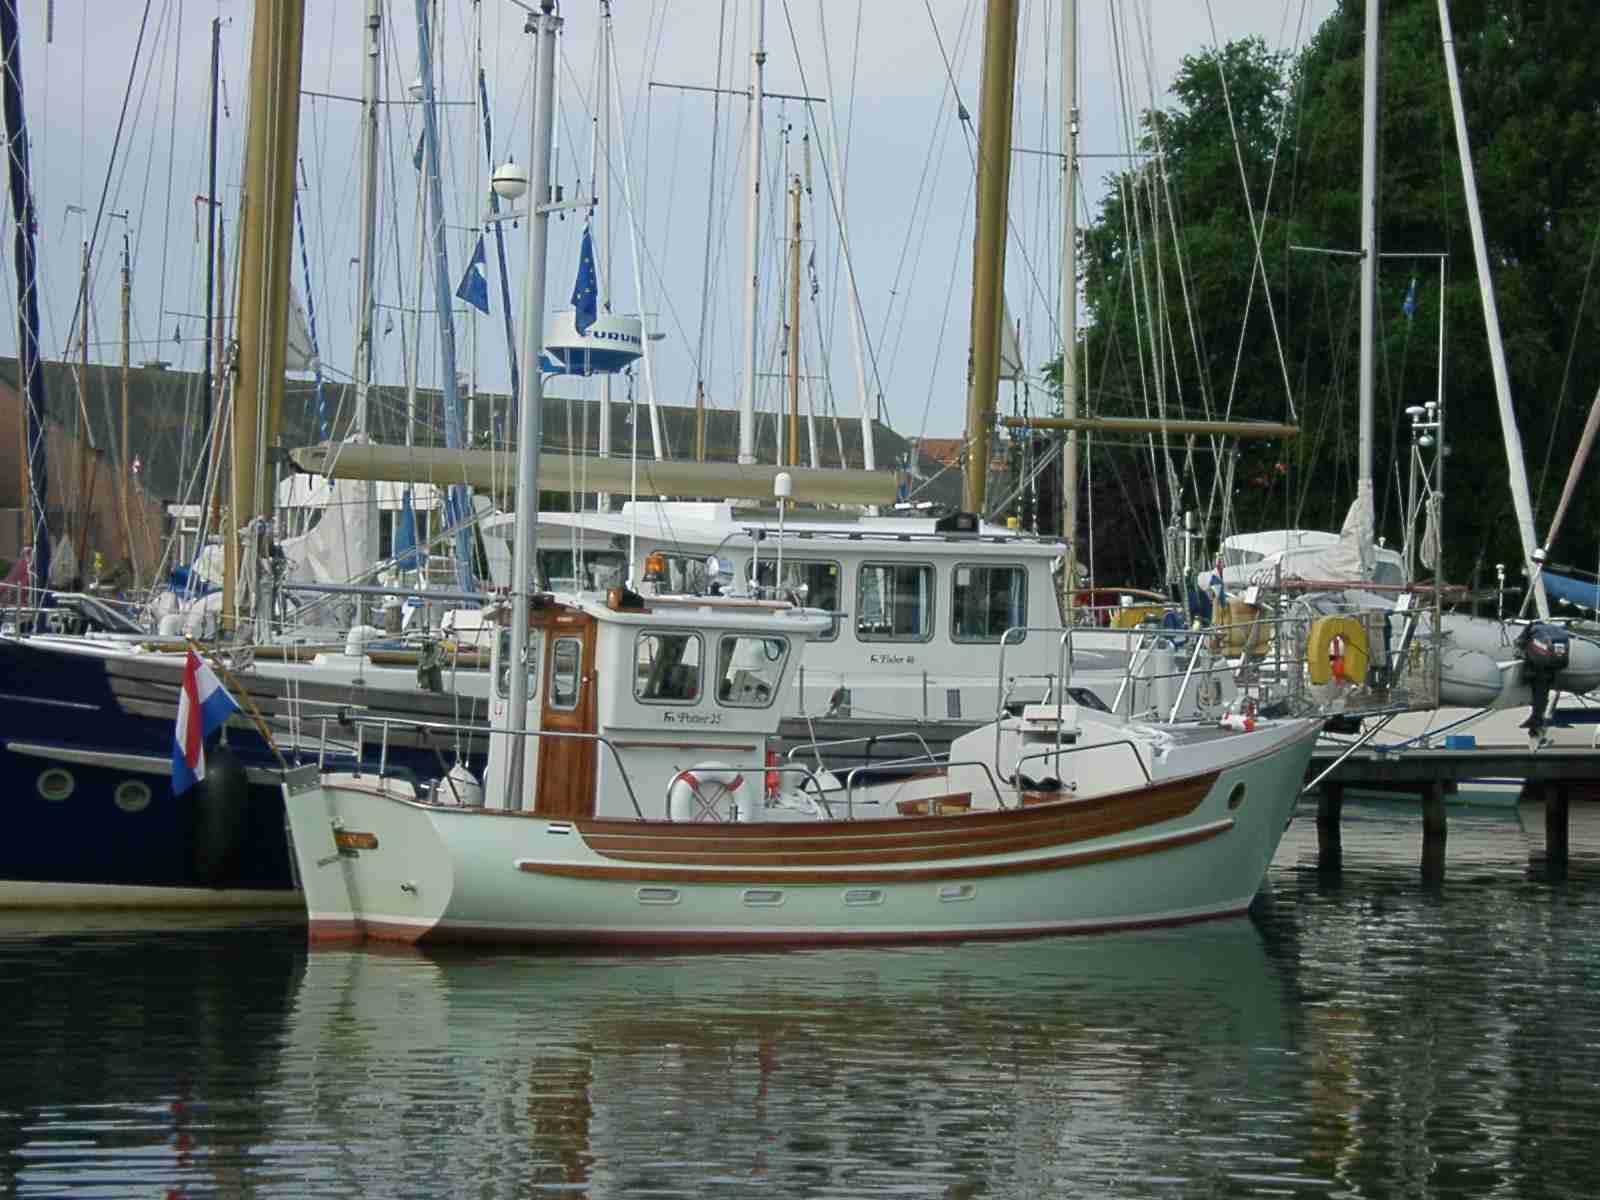 Fisher (yachts) - Wikipedia